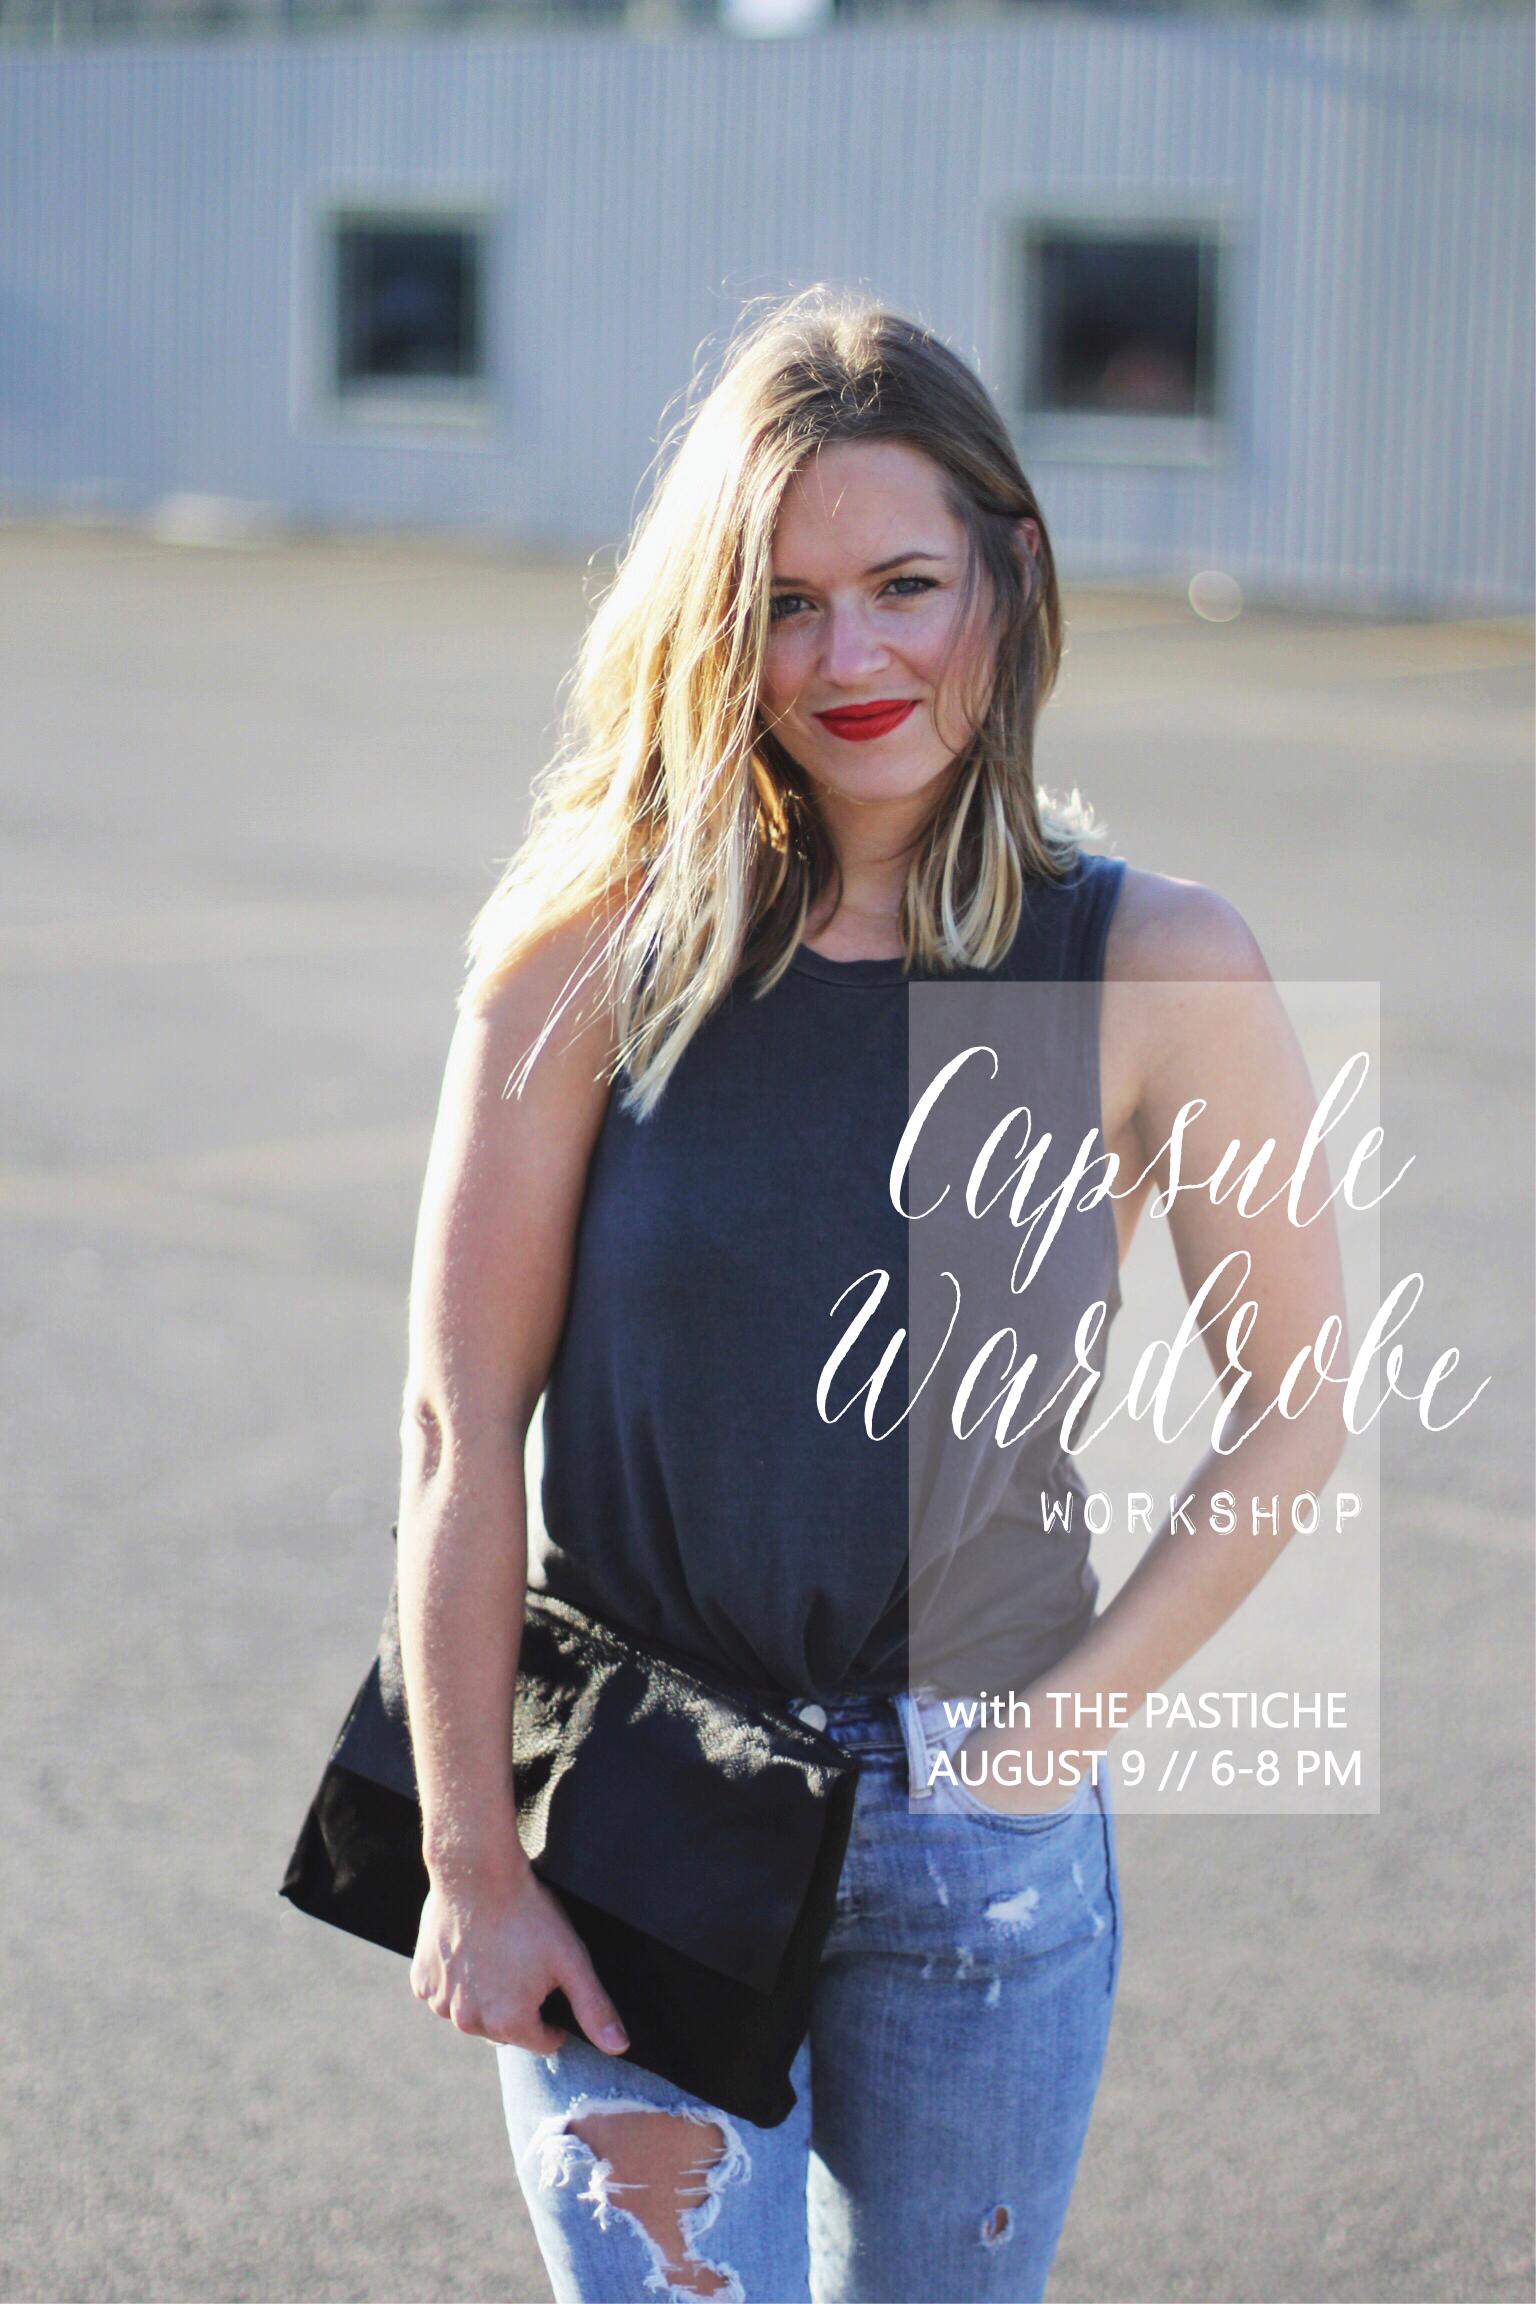 Capsule Wardrobe workshop at West Elm! - The Pastiche